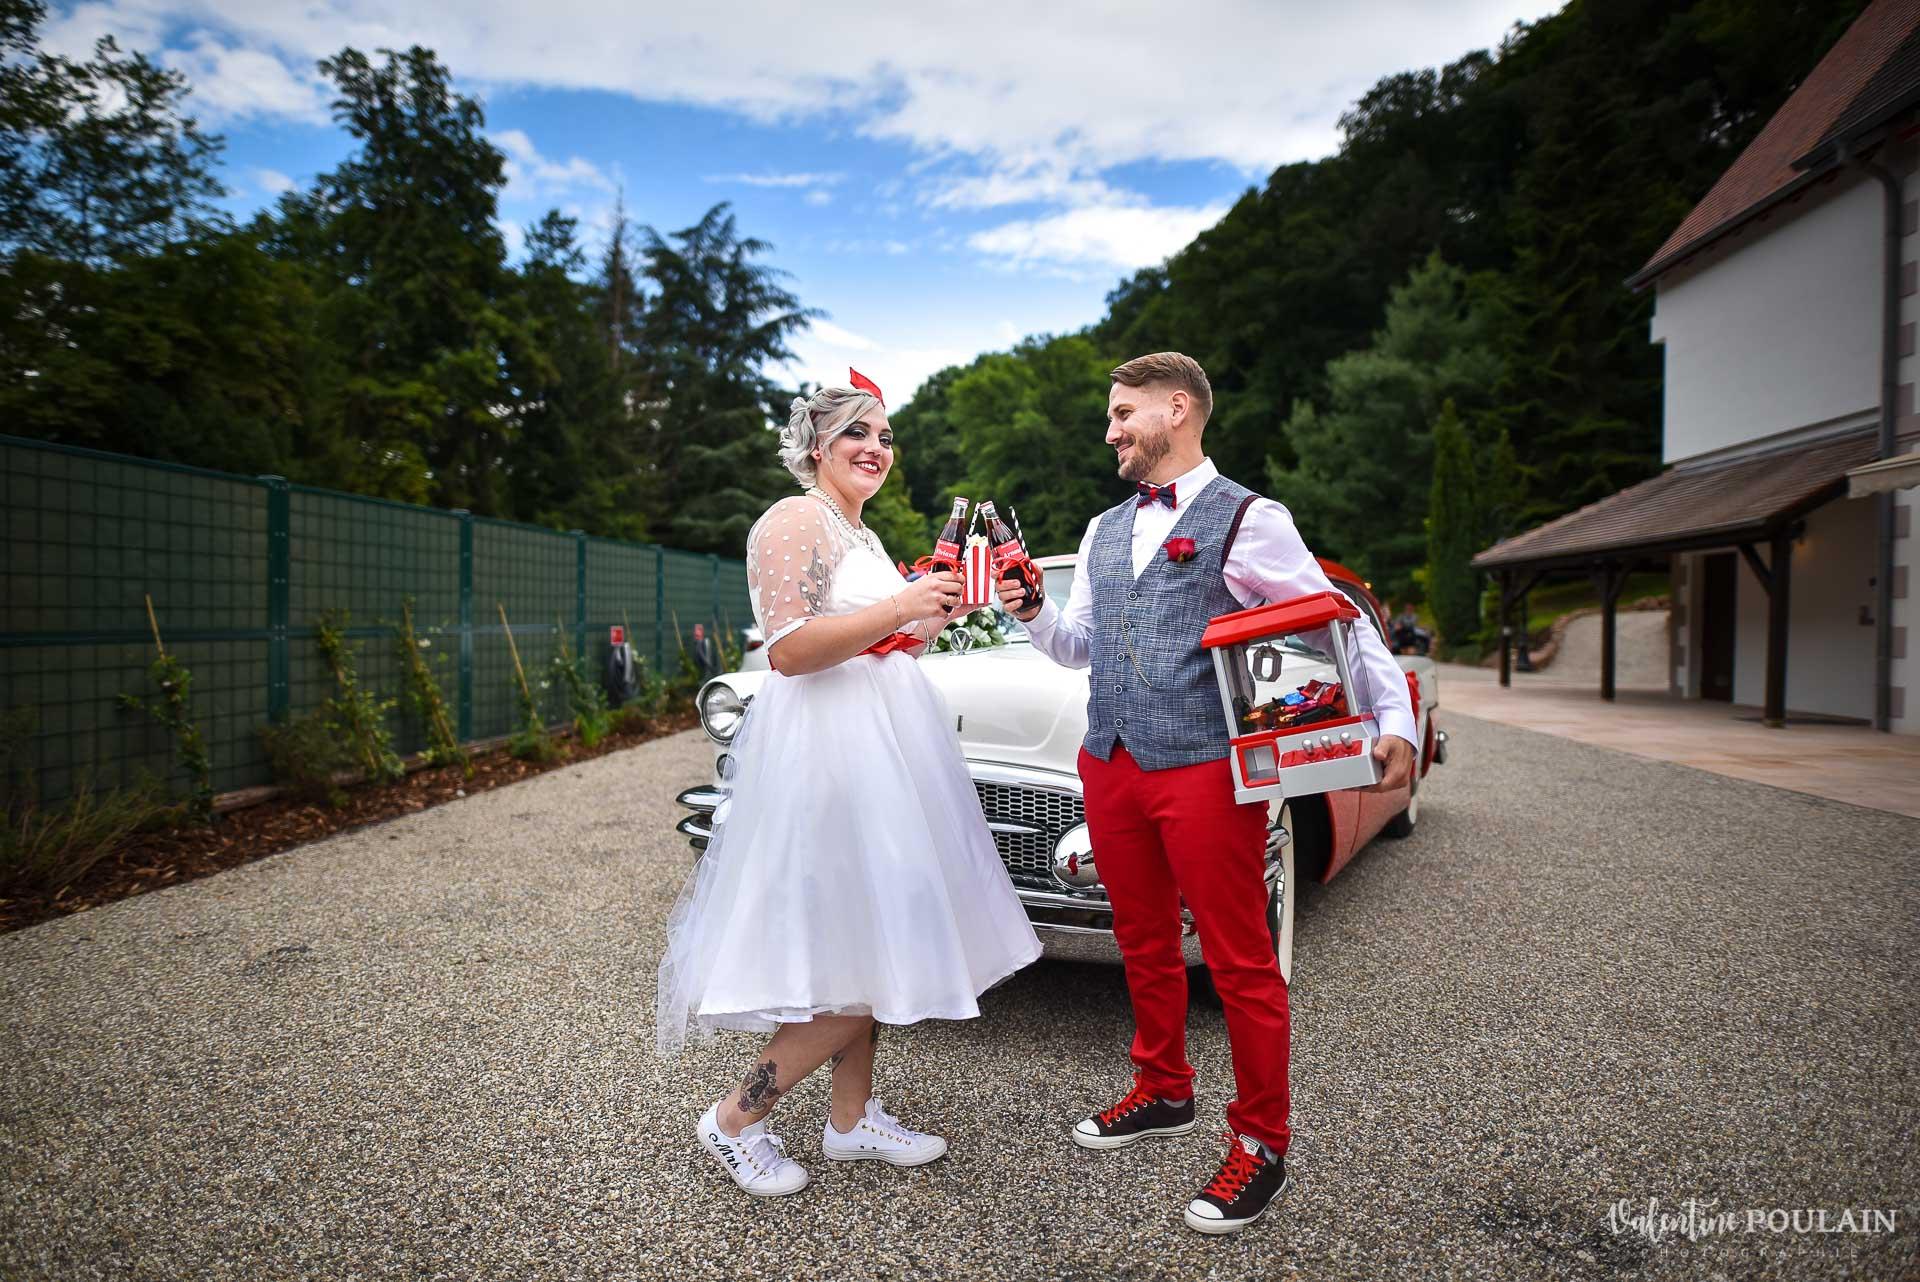 Mariage vintage rockabilly - Valentine Poulain bouteille voiture